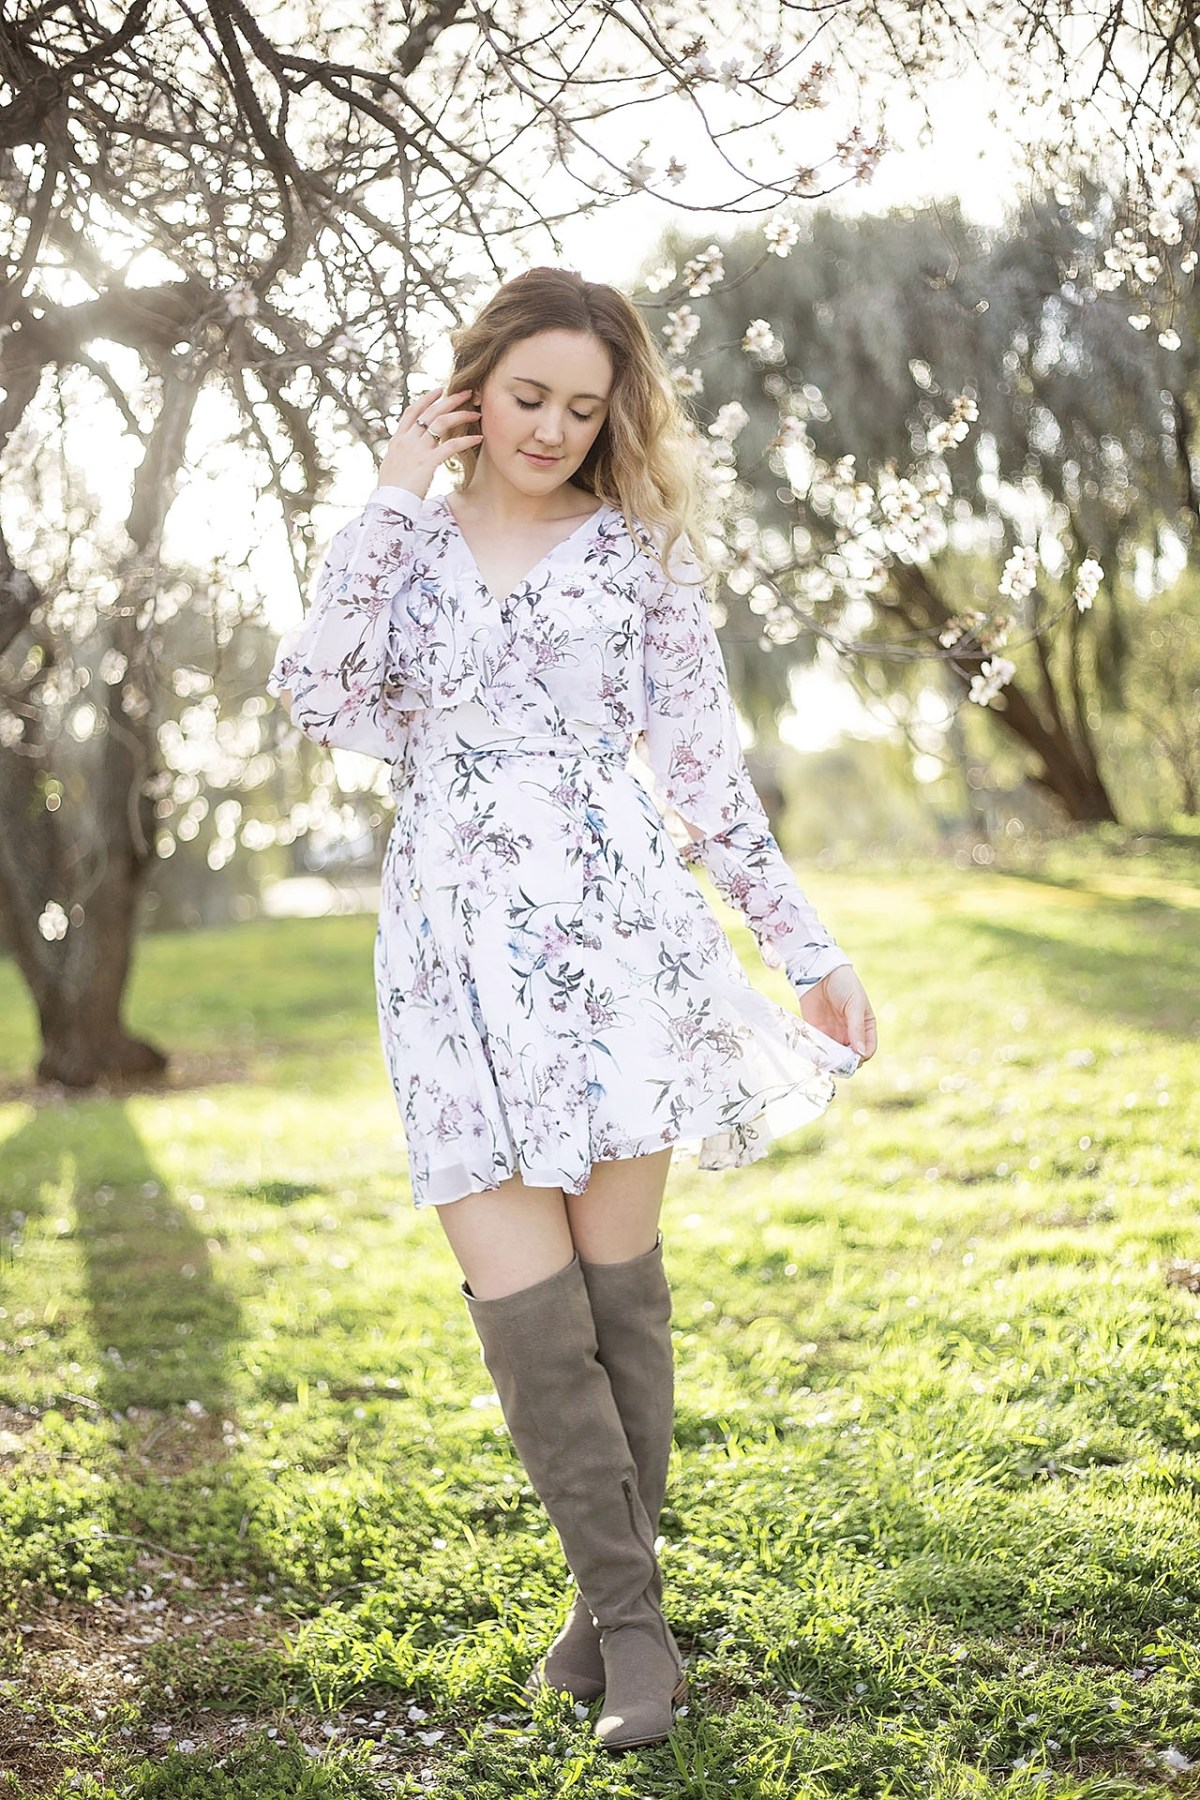 floral chiffon mini dress blossom trees honey and bramble